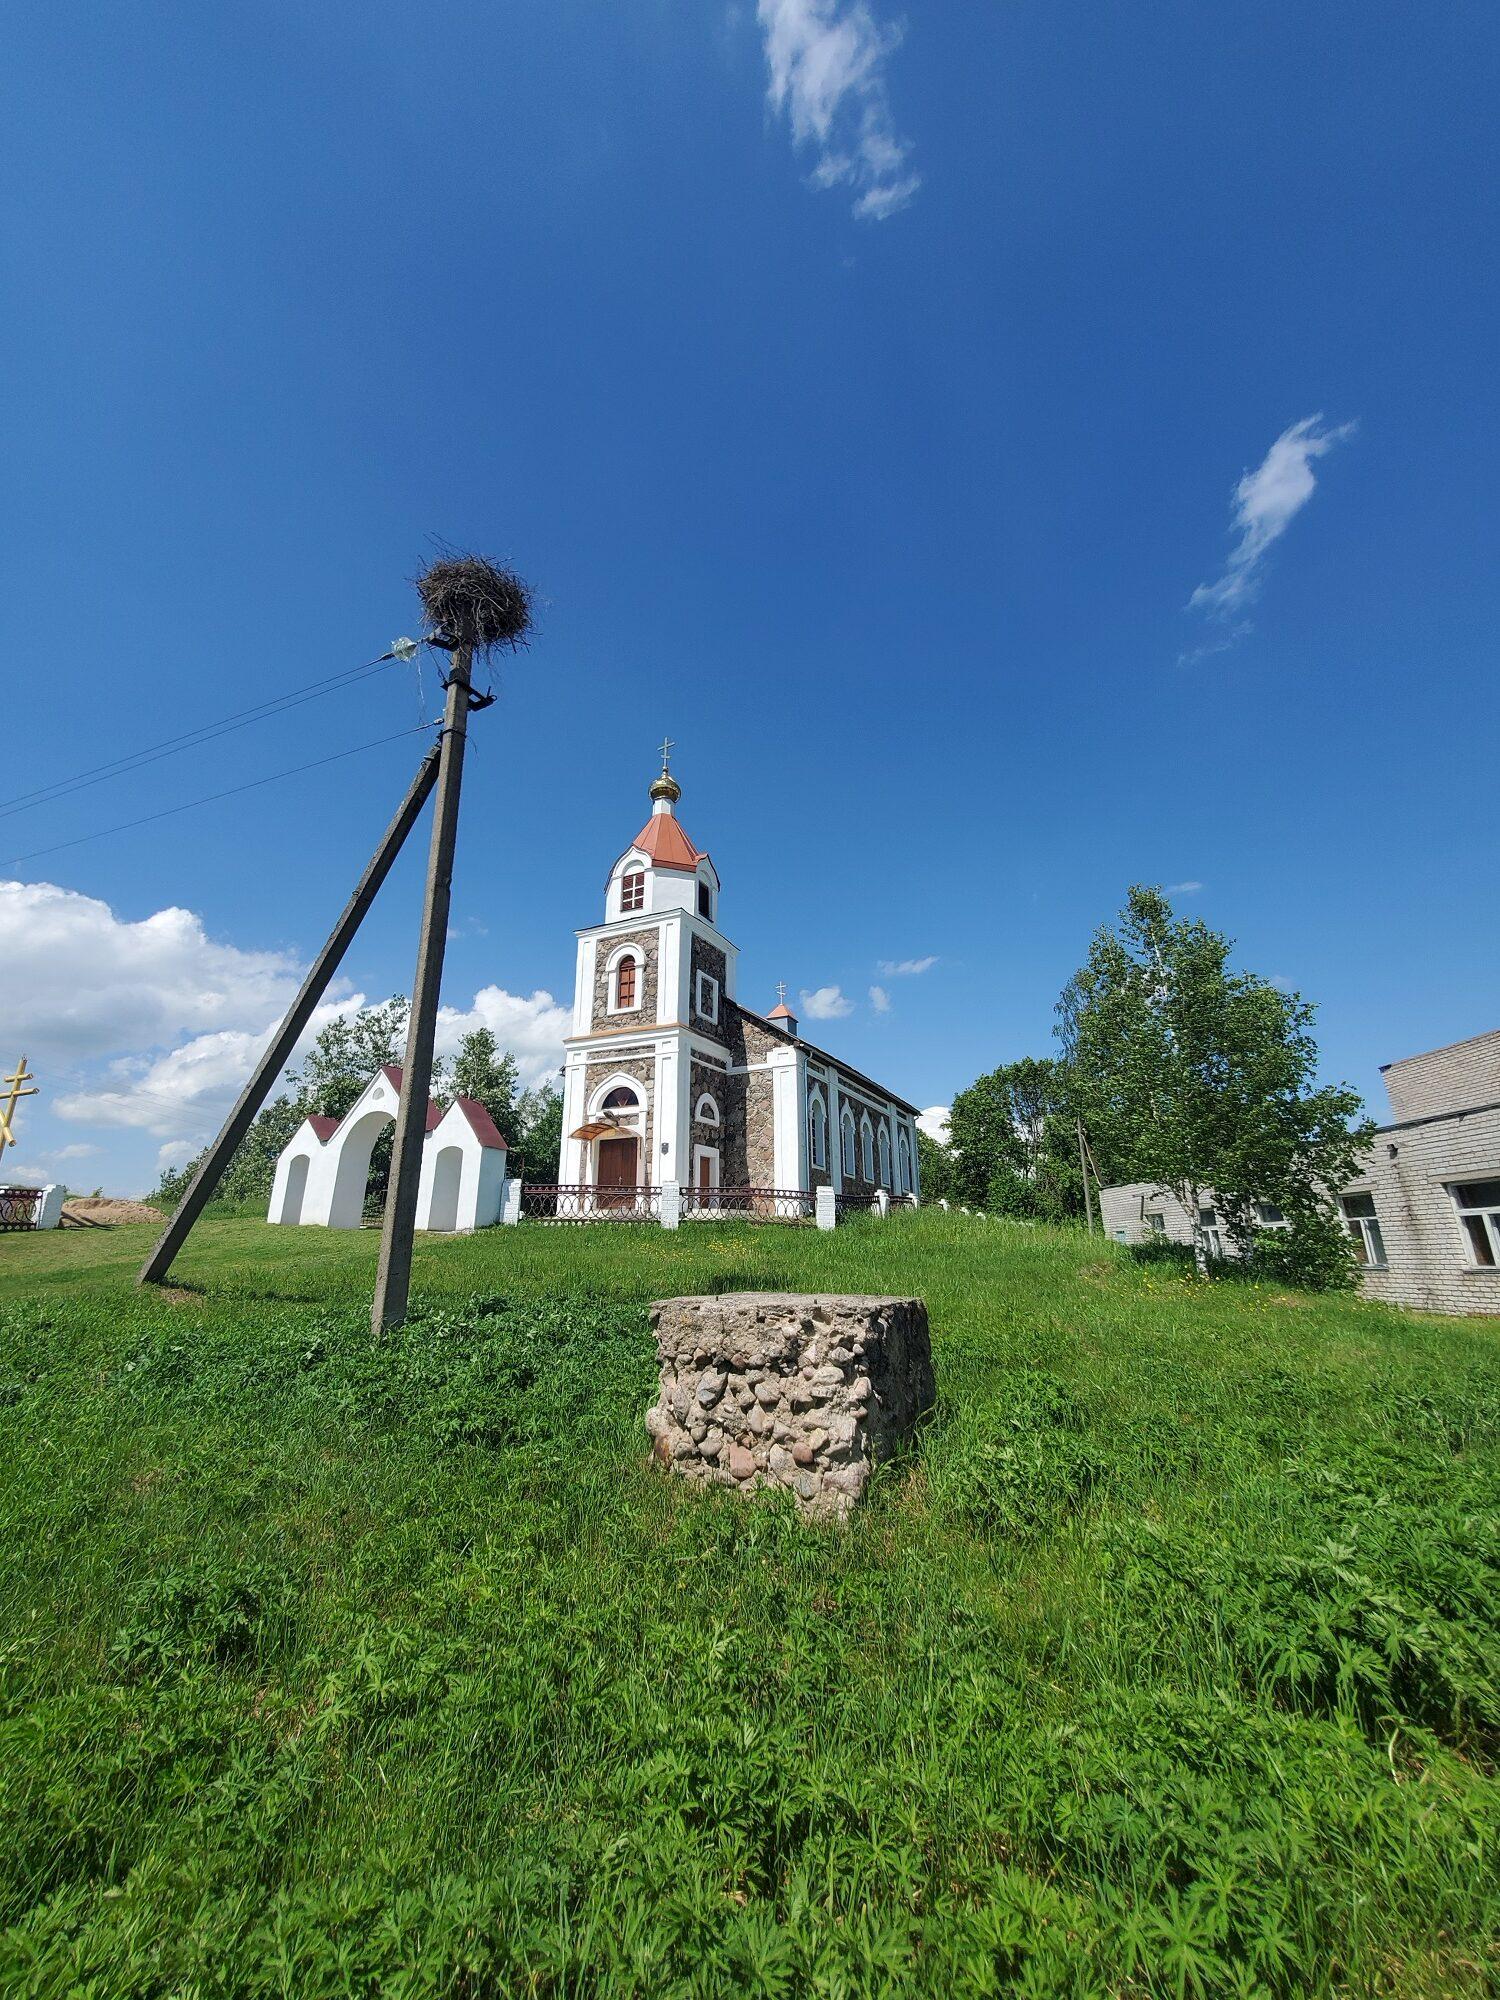 20200606 140718 rotated - Храм Рождества Иоанна Предтечи в деревне Груздово